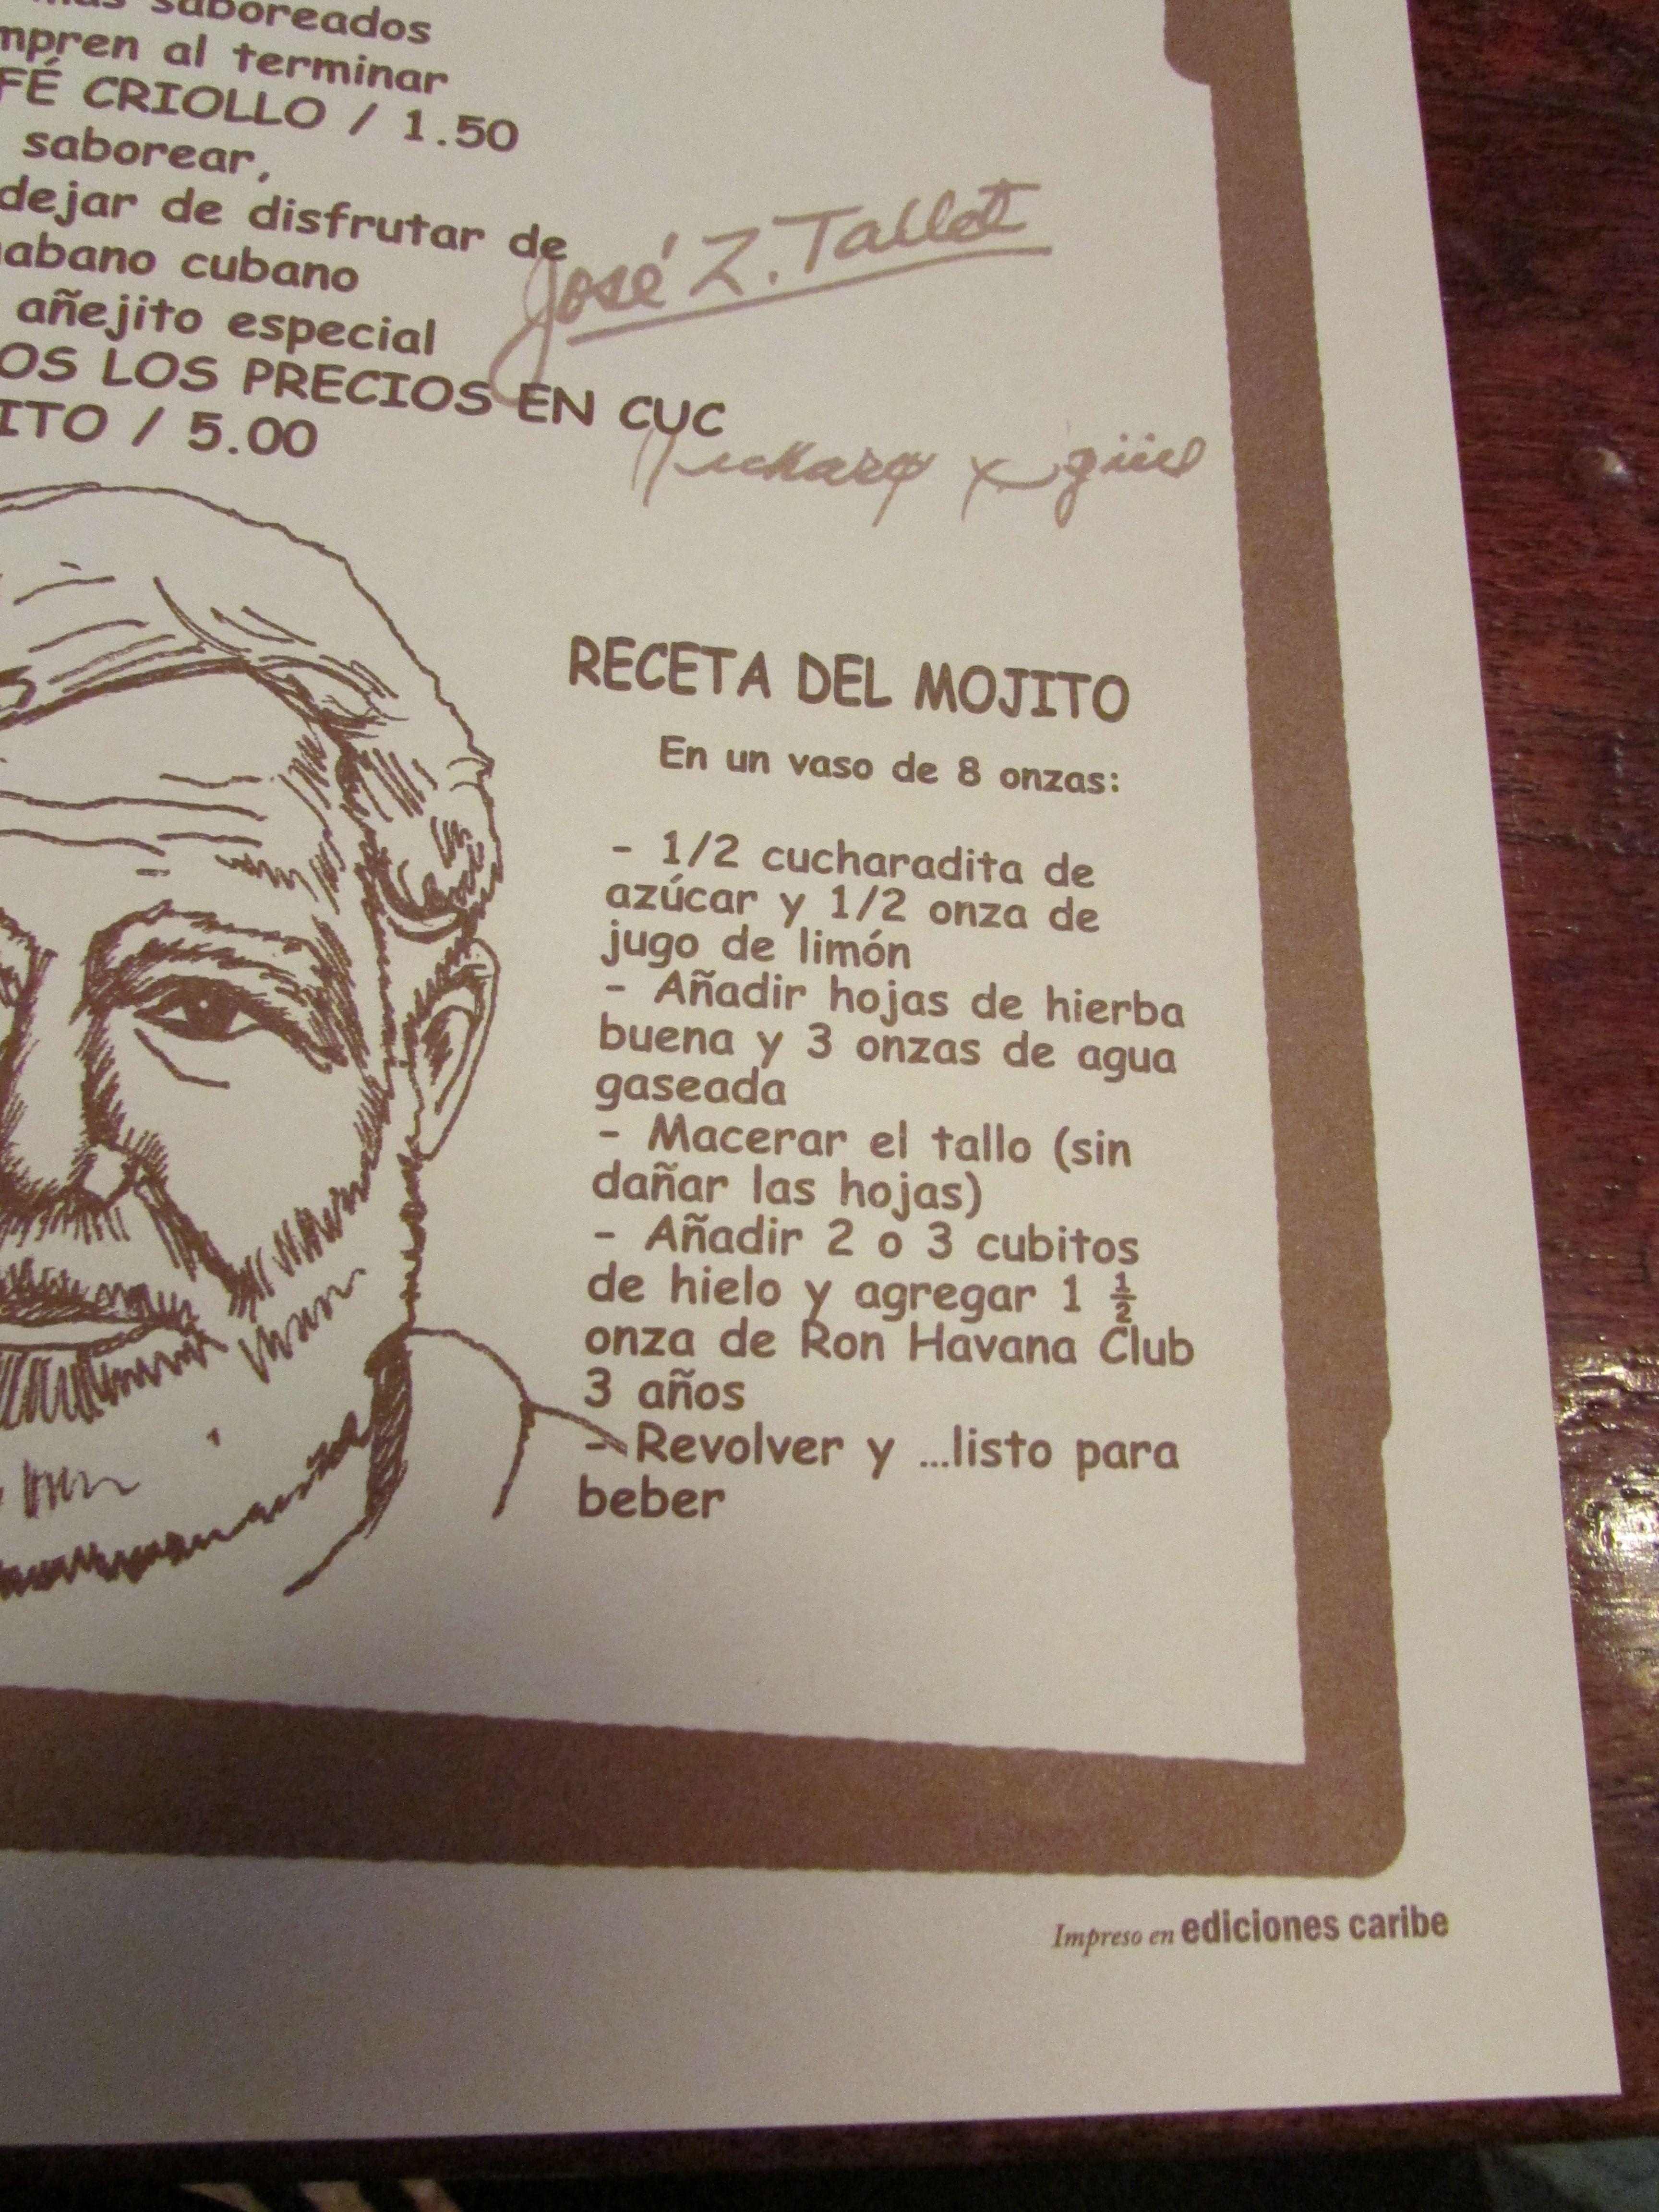 Hemingway S Favorite Mojito Recipe At La Bodeguita Del Medio Havana